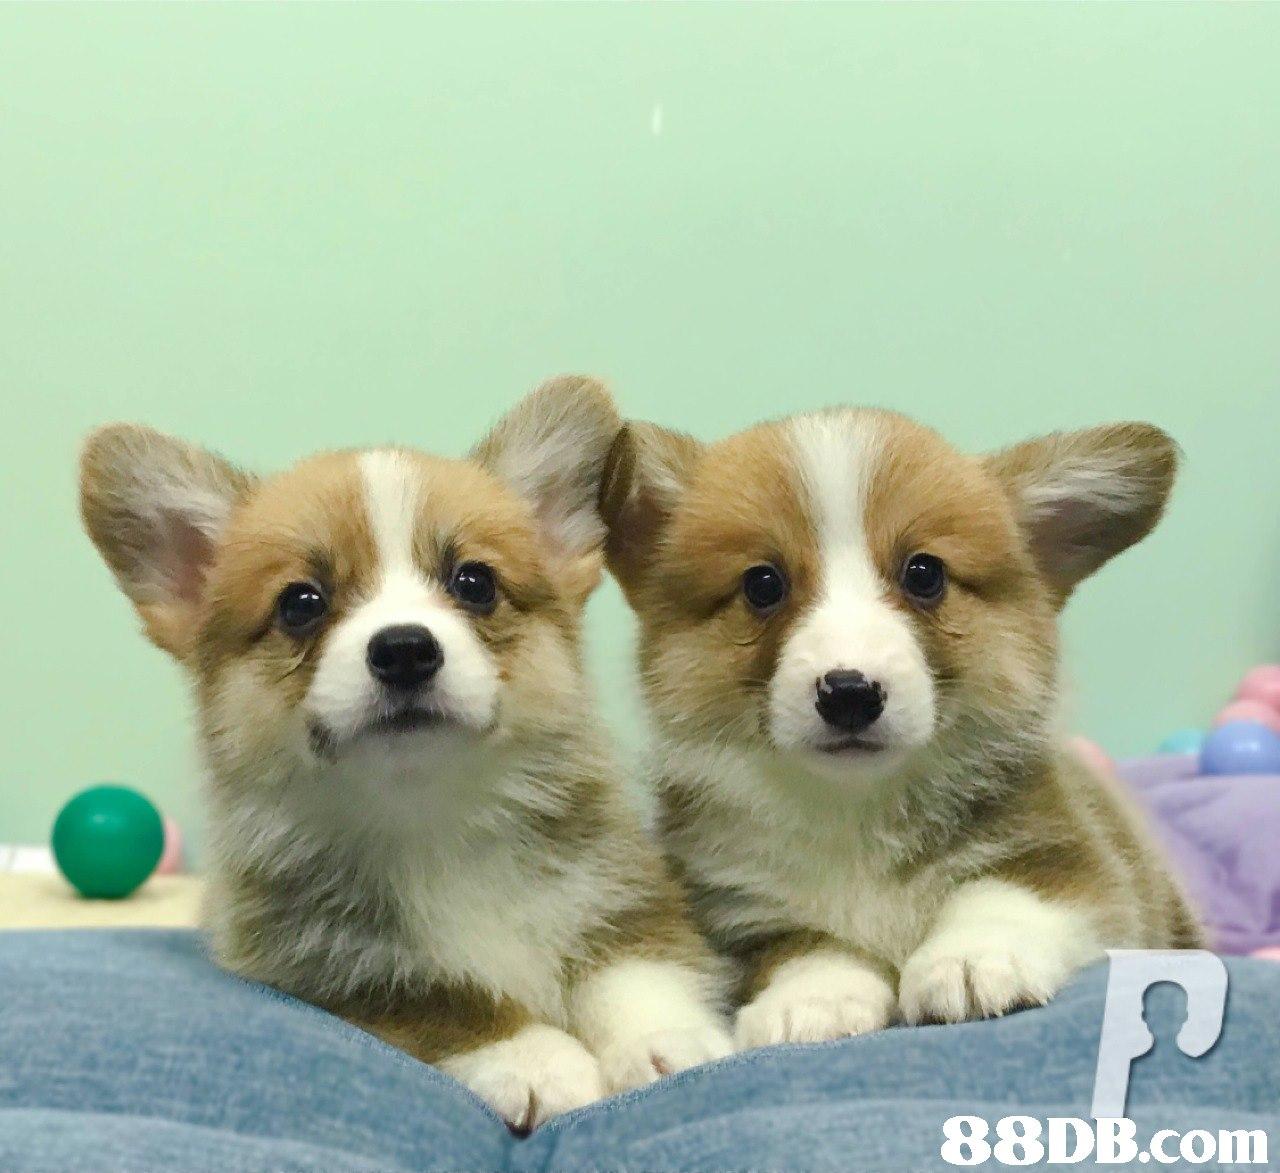 88DB.com  dog,dog like mammal,welsh corgi,dog breed,mammal